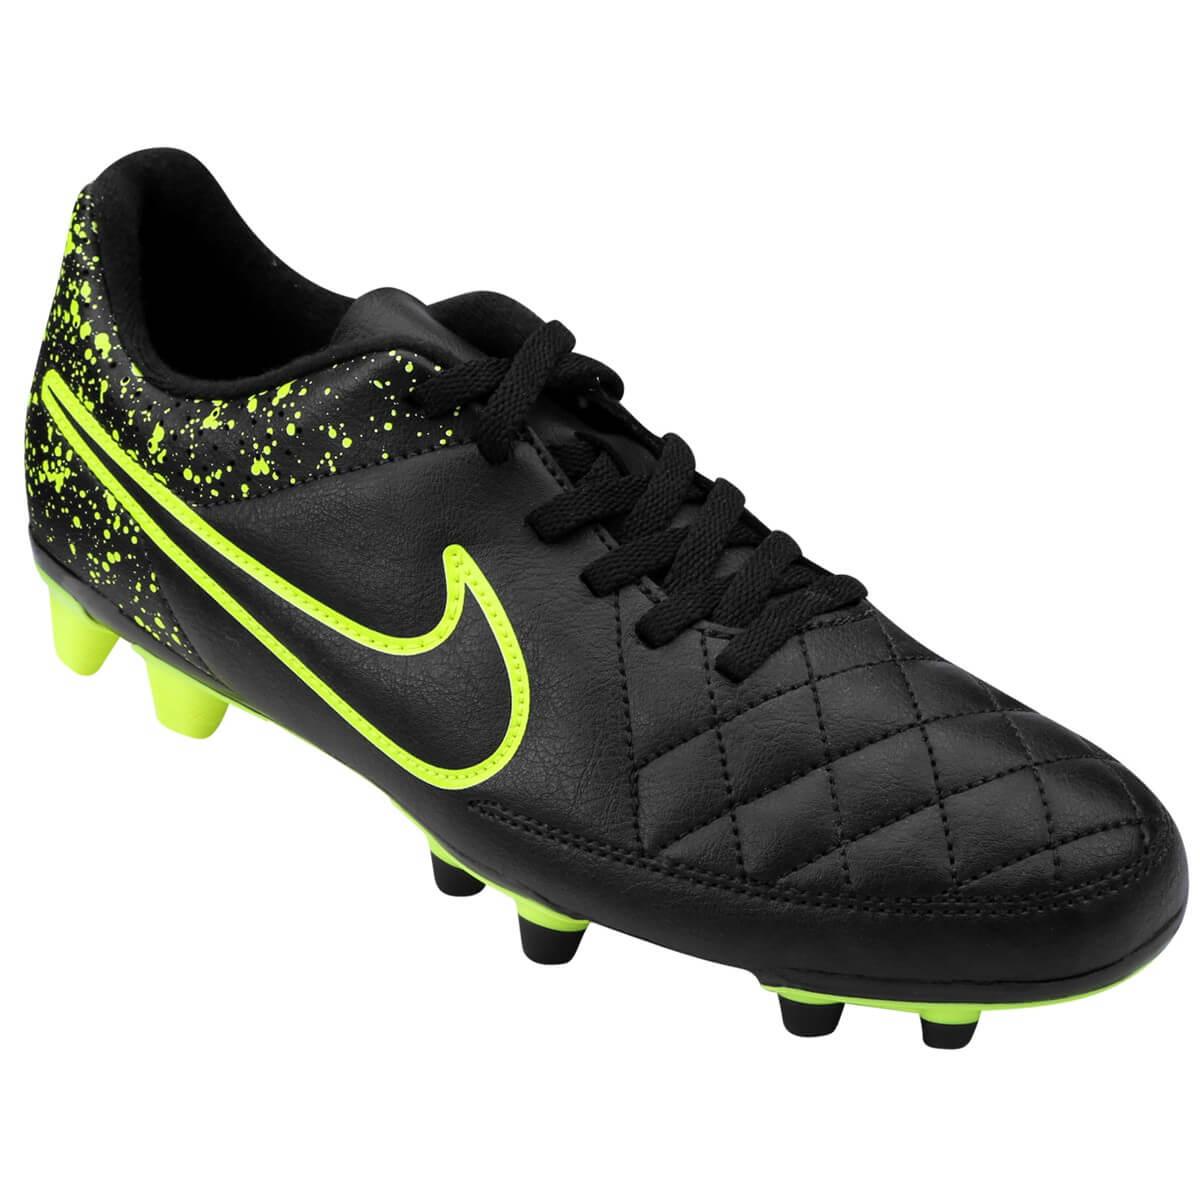 bf3050c244 Chuteira Nike Tiempo Rio 2 FG Campo - Decker Online!